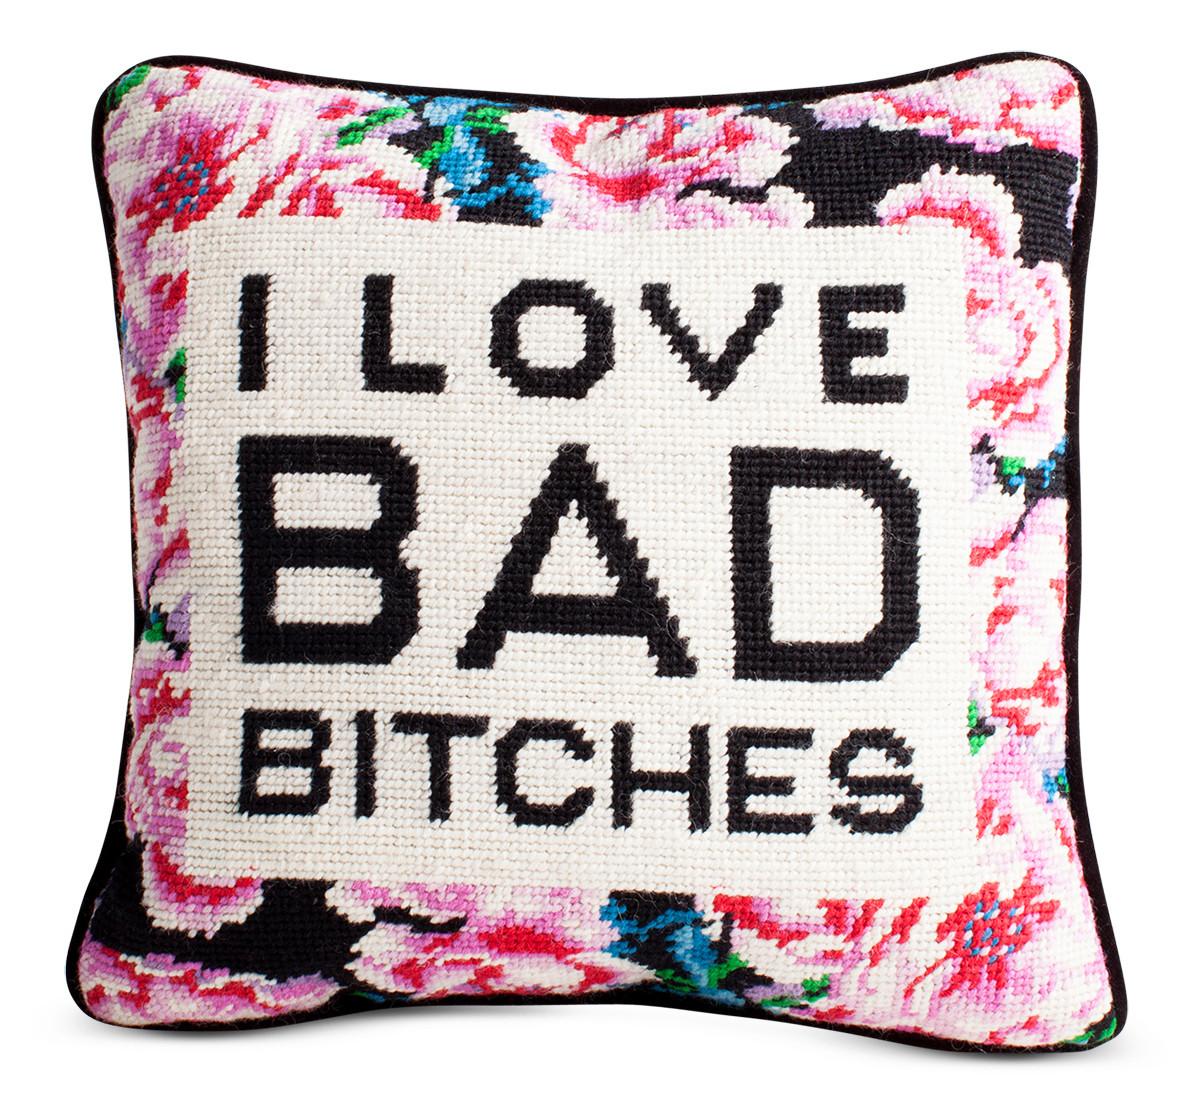 3) Cushion by Furbish Studio